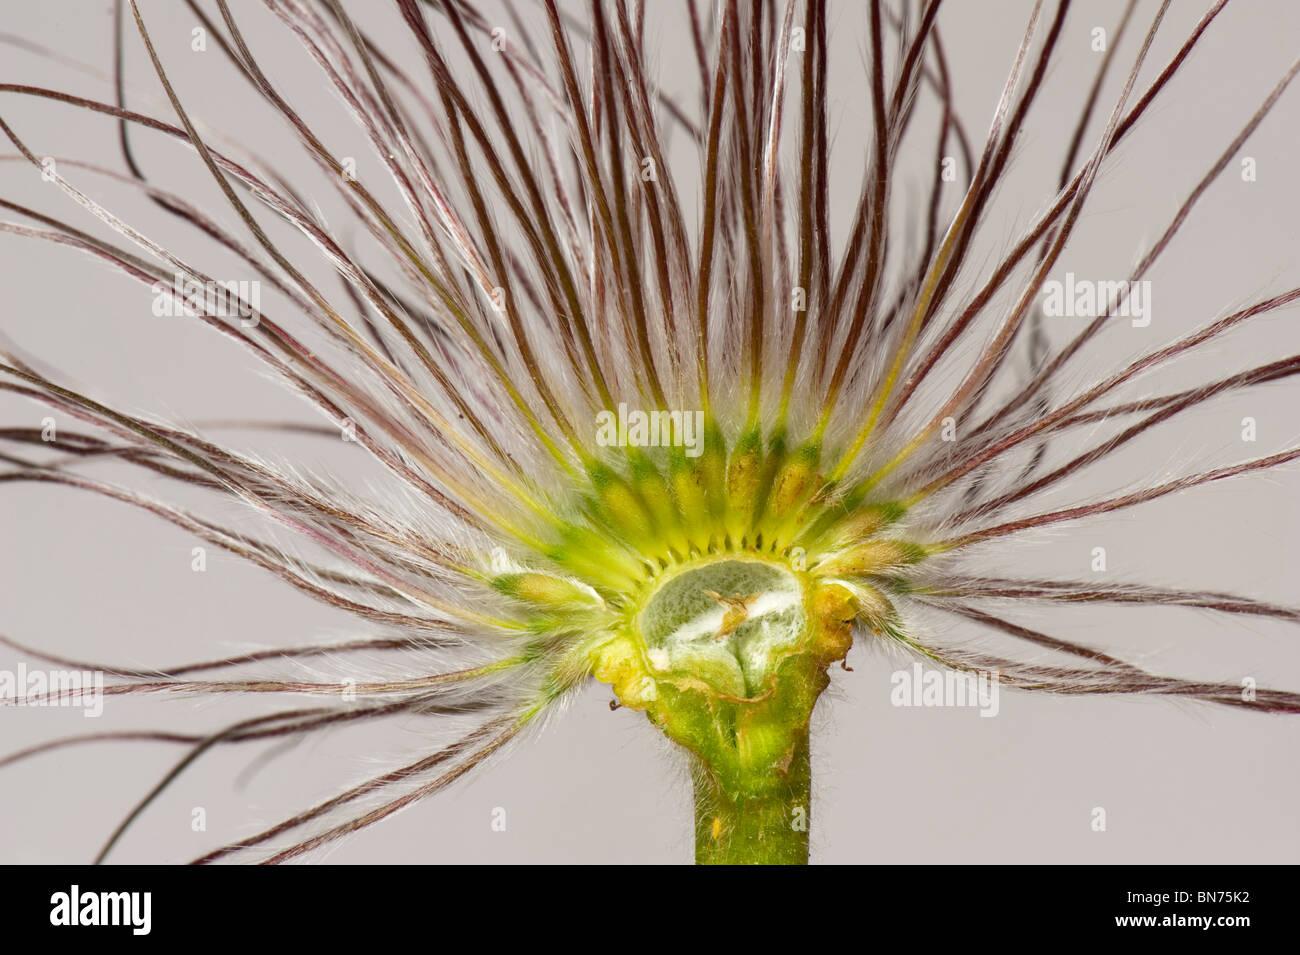 Pasque flower (Pulsatilla vulgaris) seedhead section - Stock Image